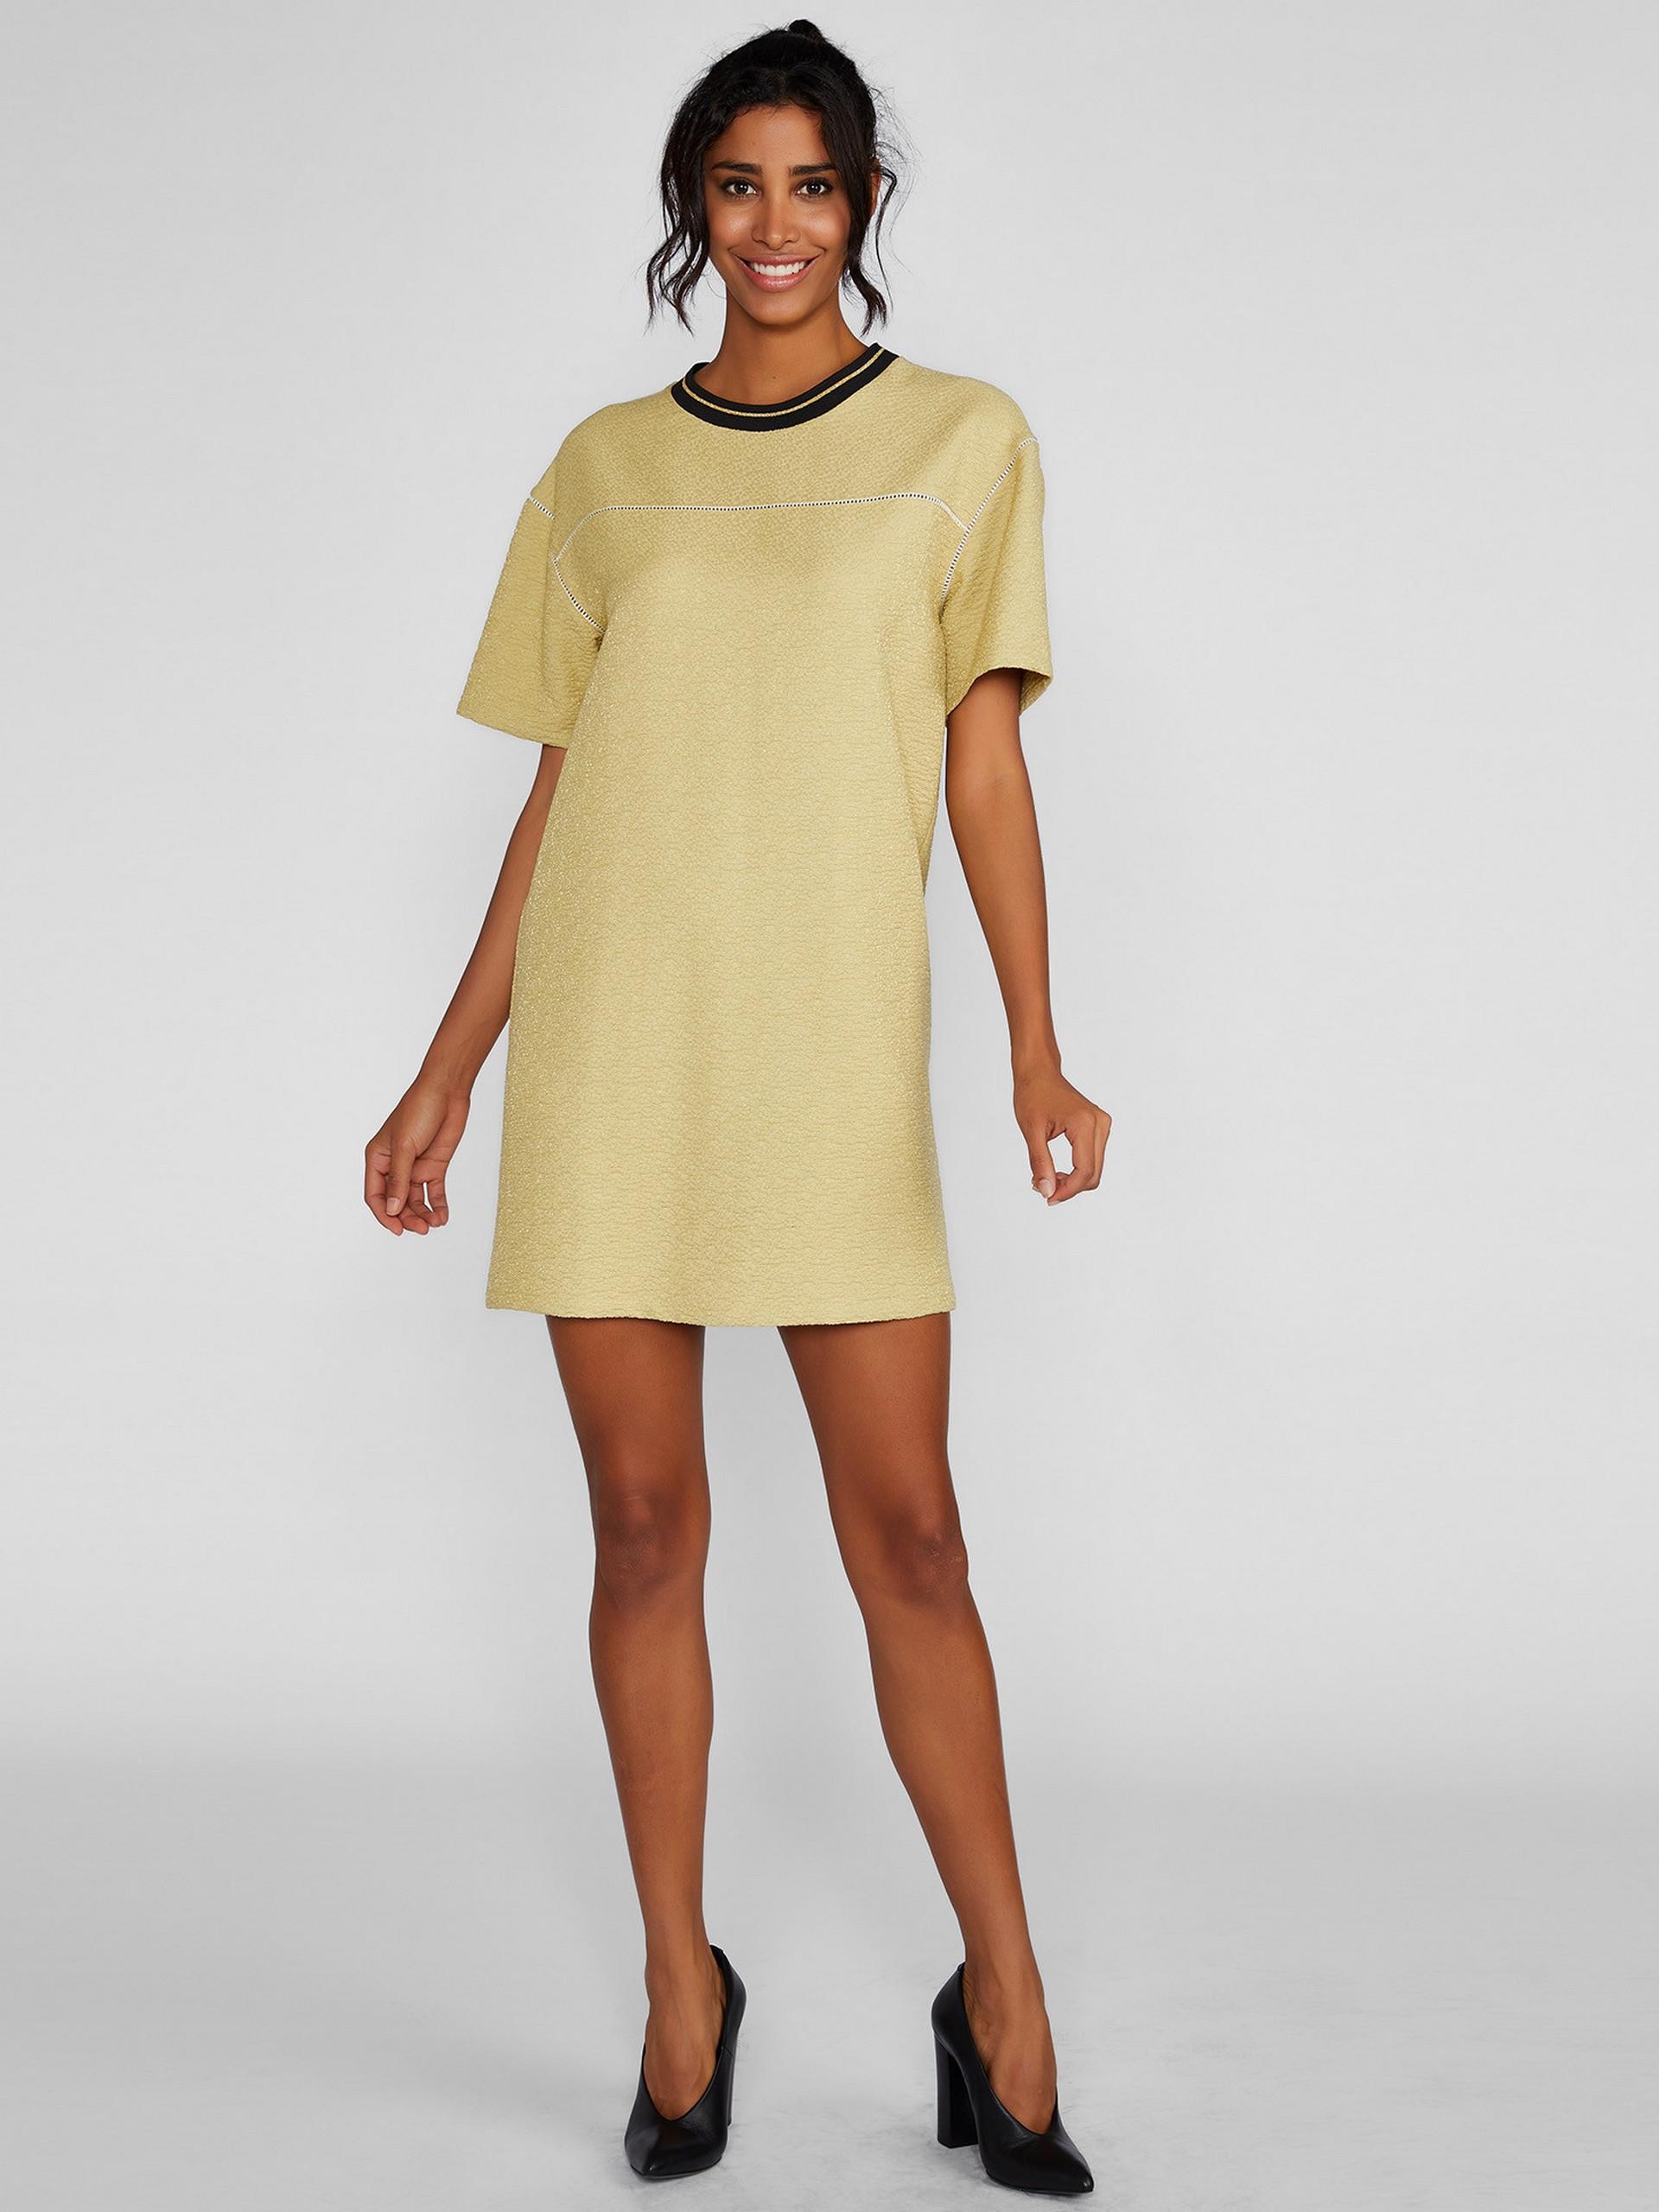 Round Neck Short Sleeve Mini Dress